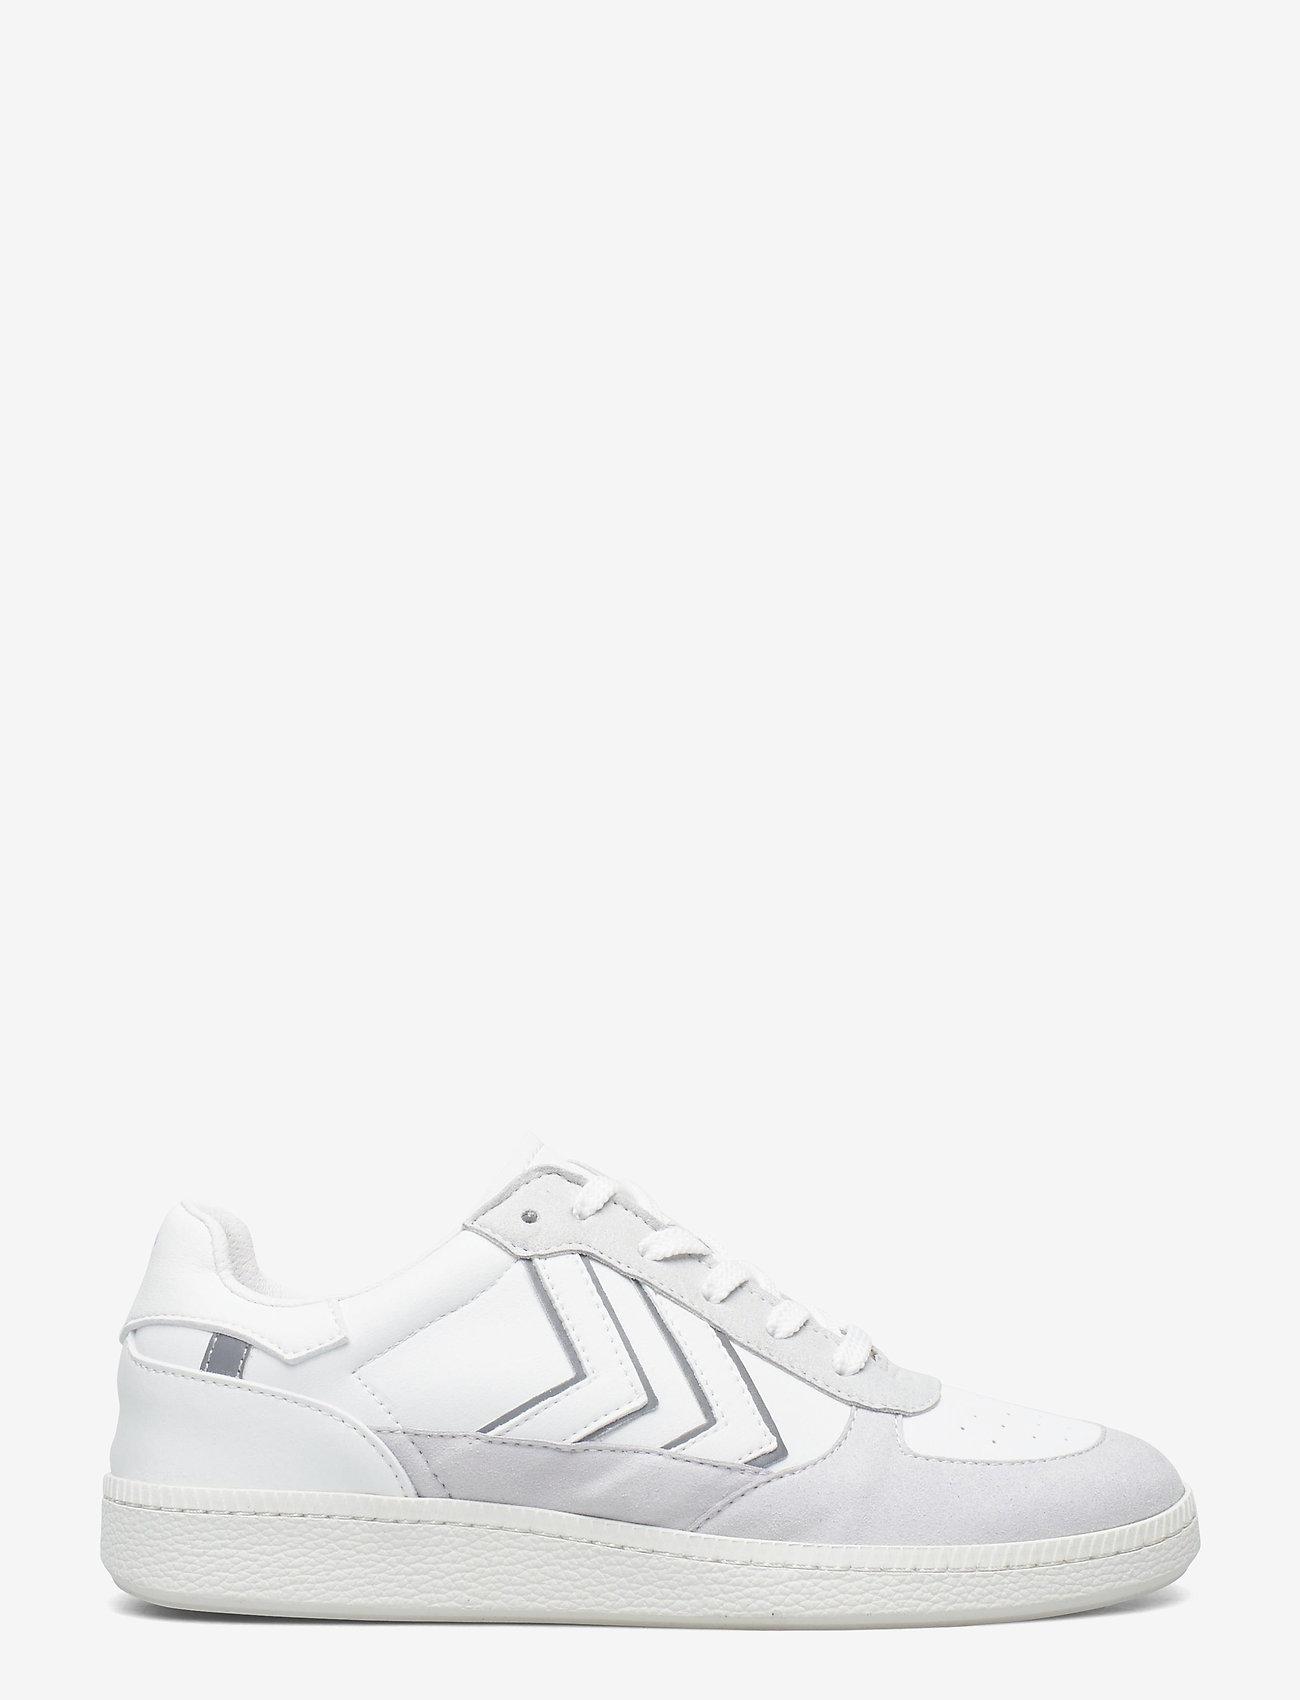 Hummel - VICTORY PREMIUM - laag sneakers - white - 1